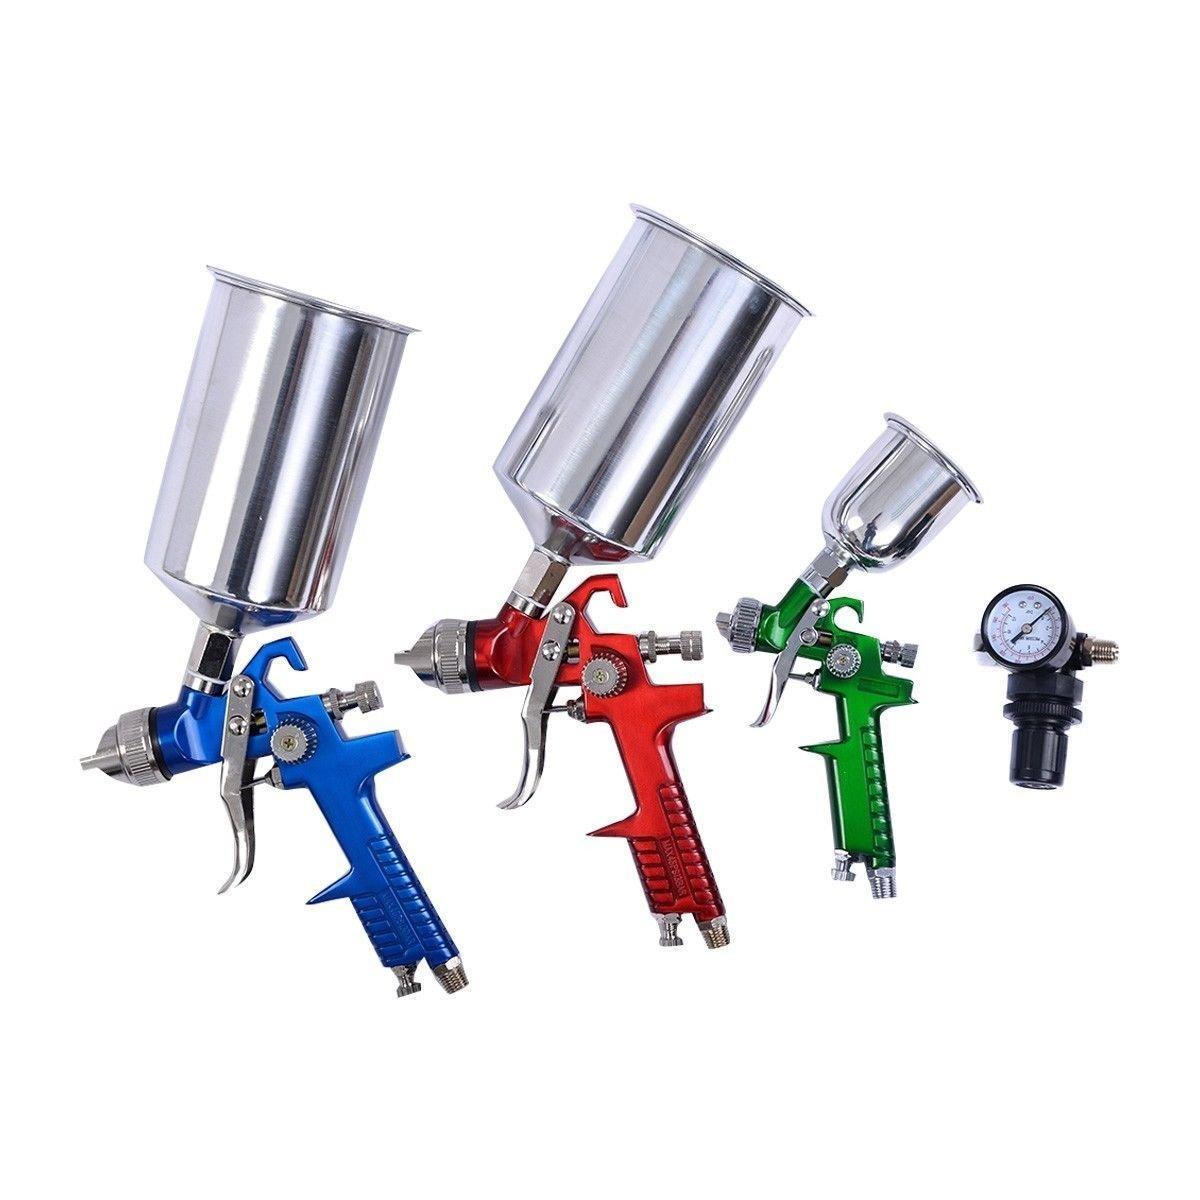 3 Pcs HVLP Air Spray Gun Kit Gravity Feed Automotive Paint Car Primer Detail Basecoat Set